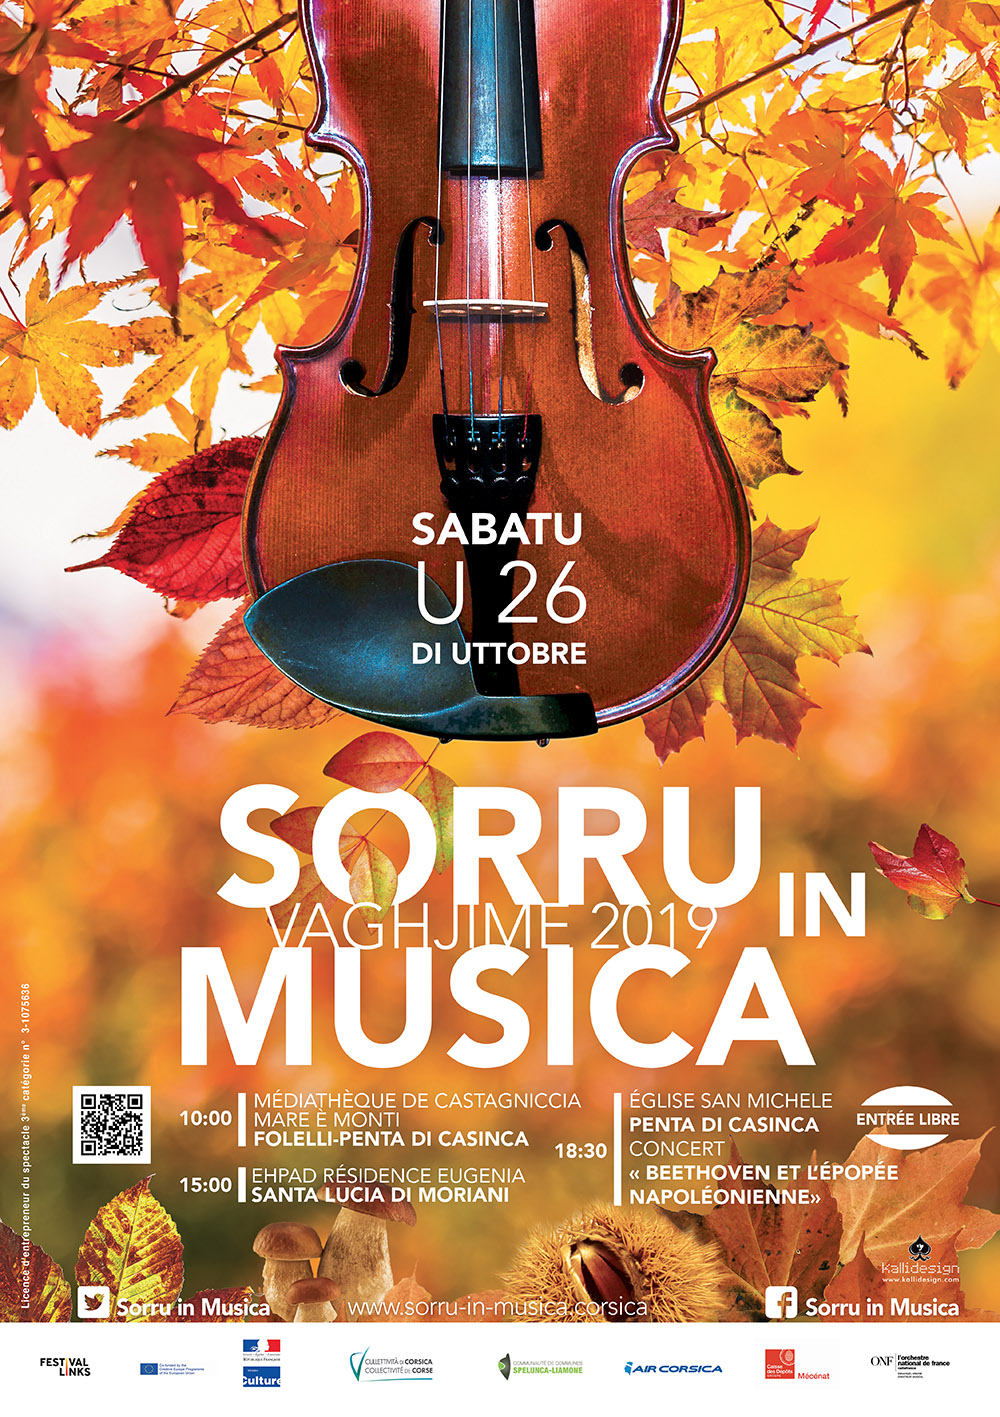 Plaine Orientale : Le programme de Sorru in Musica Vaghjime